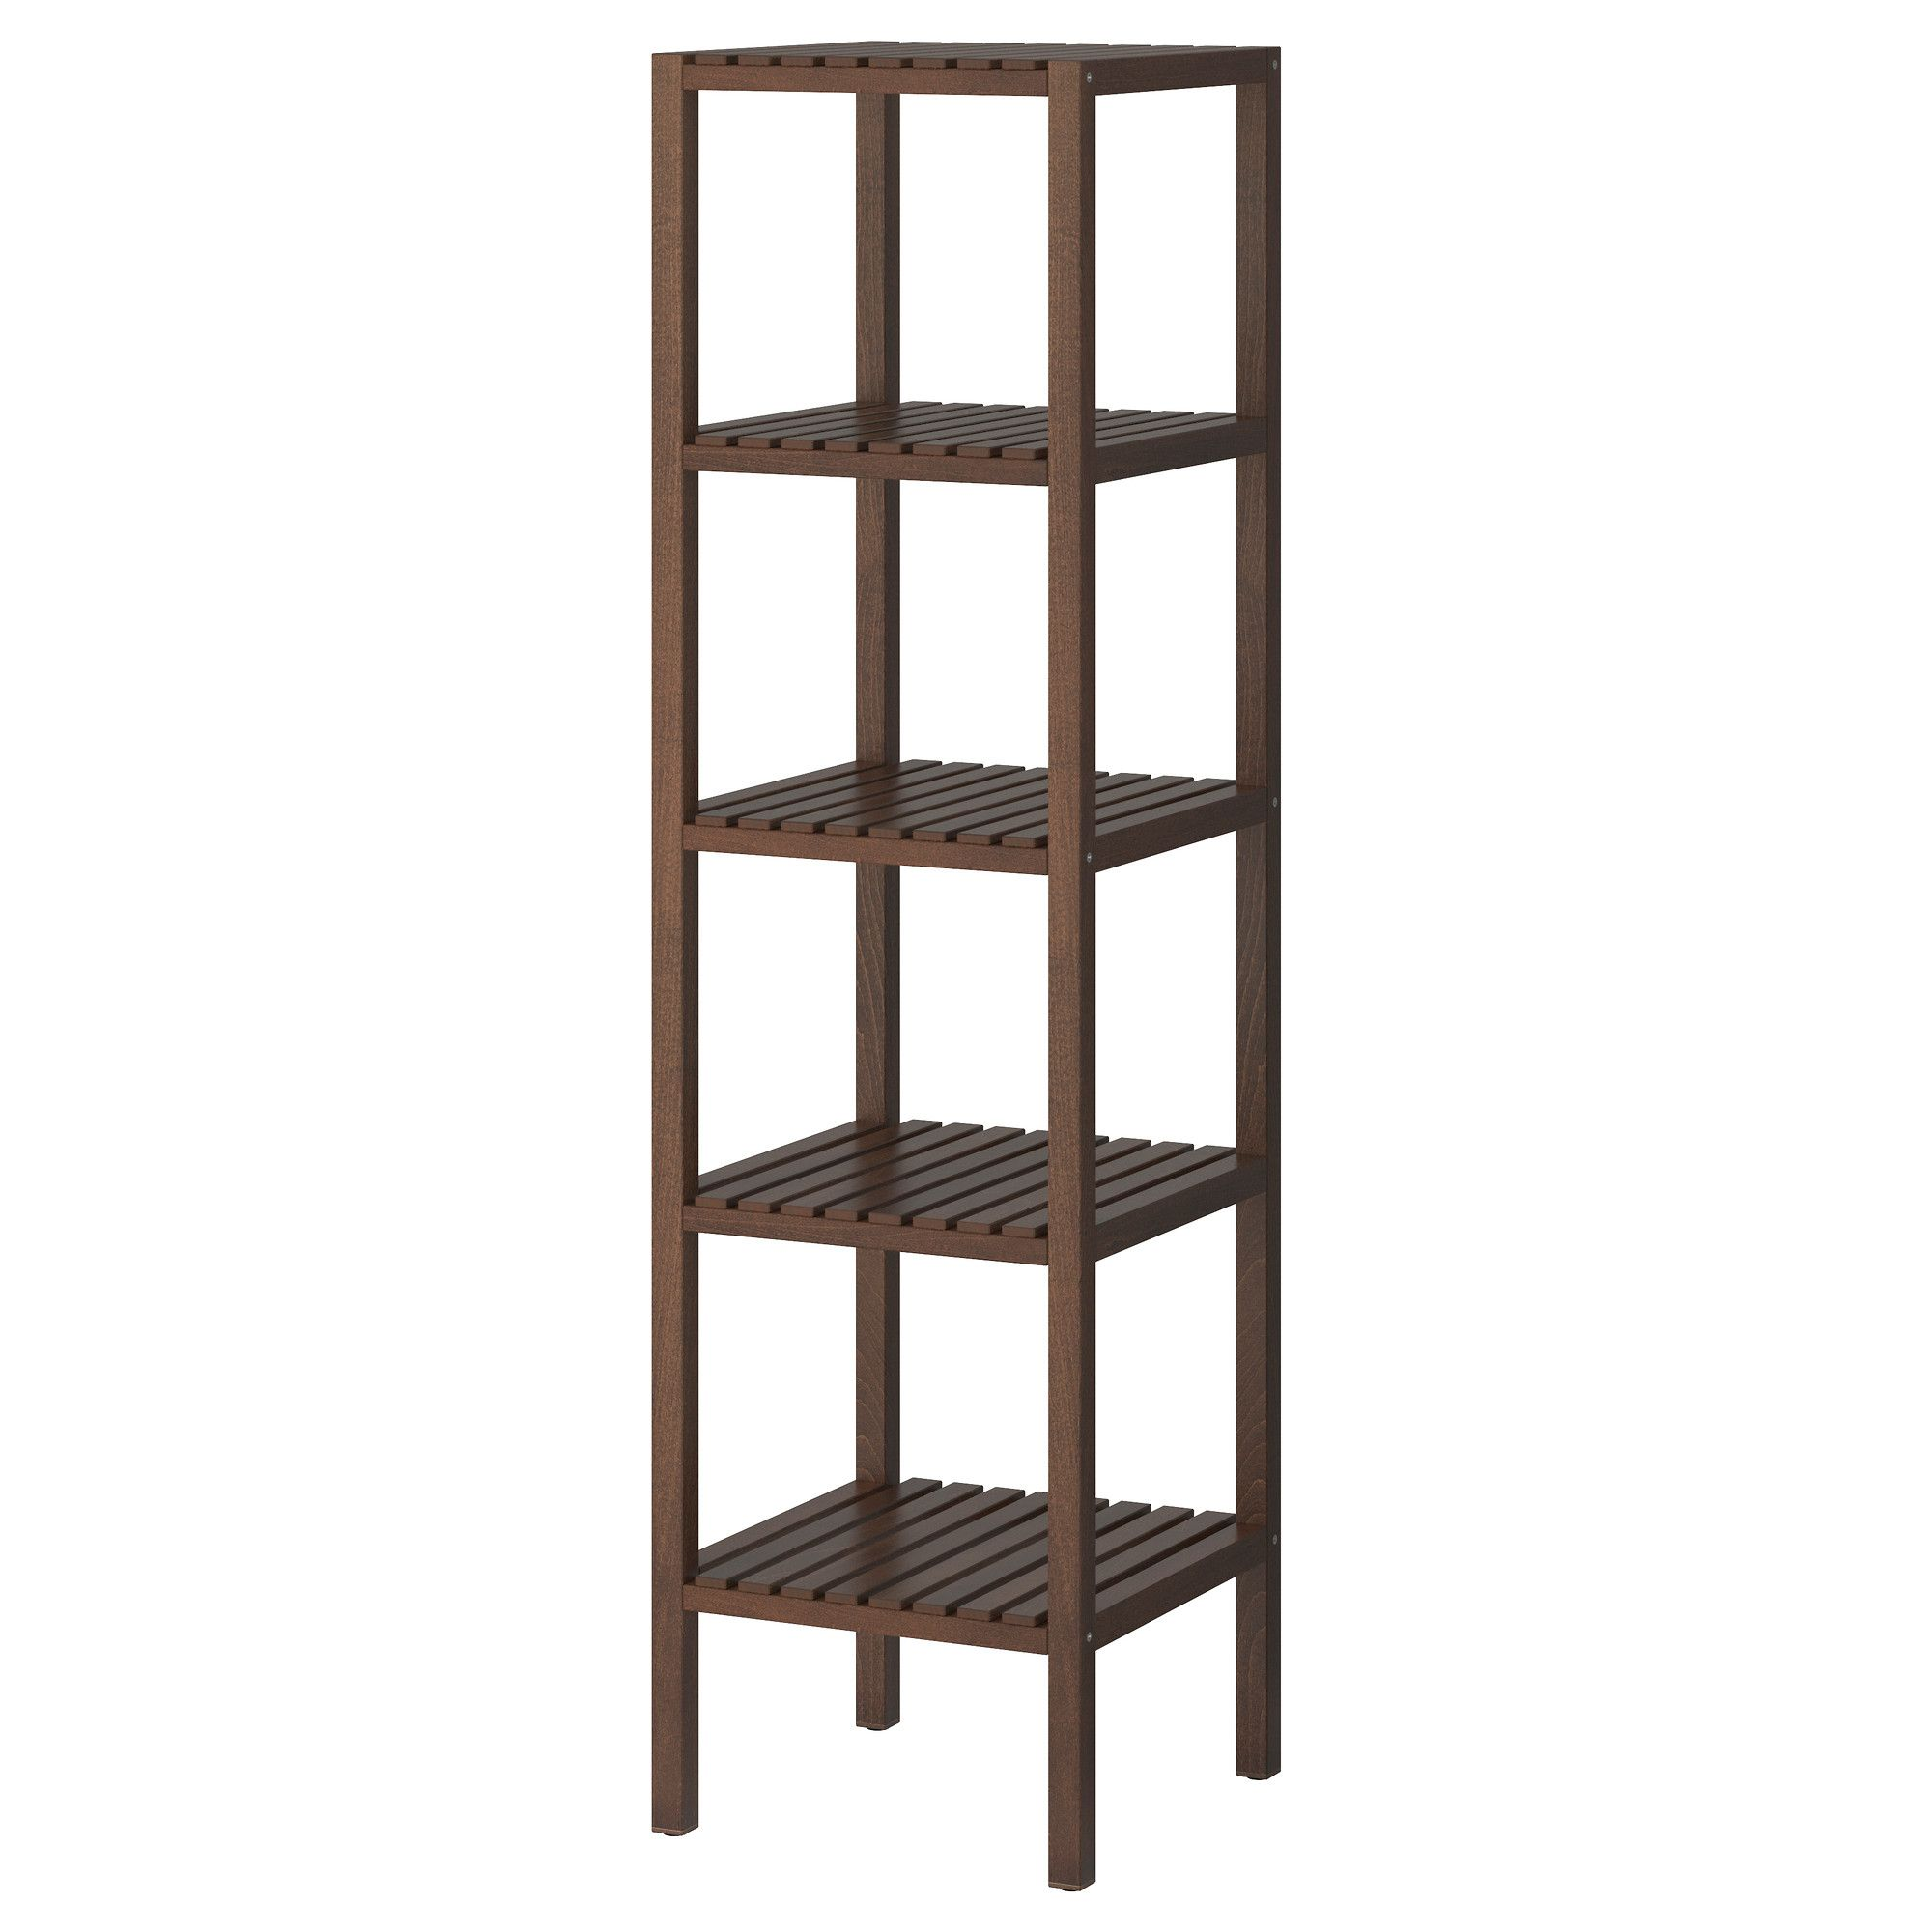 Ikea Badregal molger shelf unit birch brown open shelves and bathroom stuff